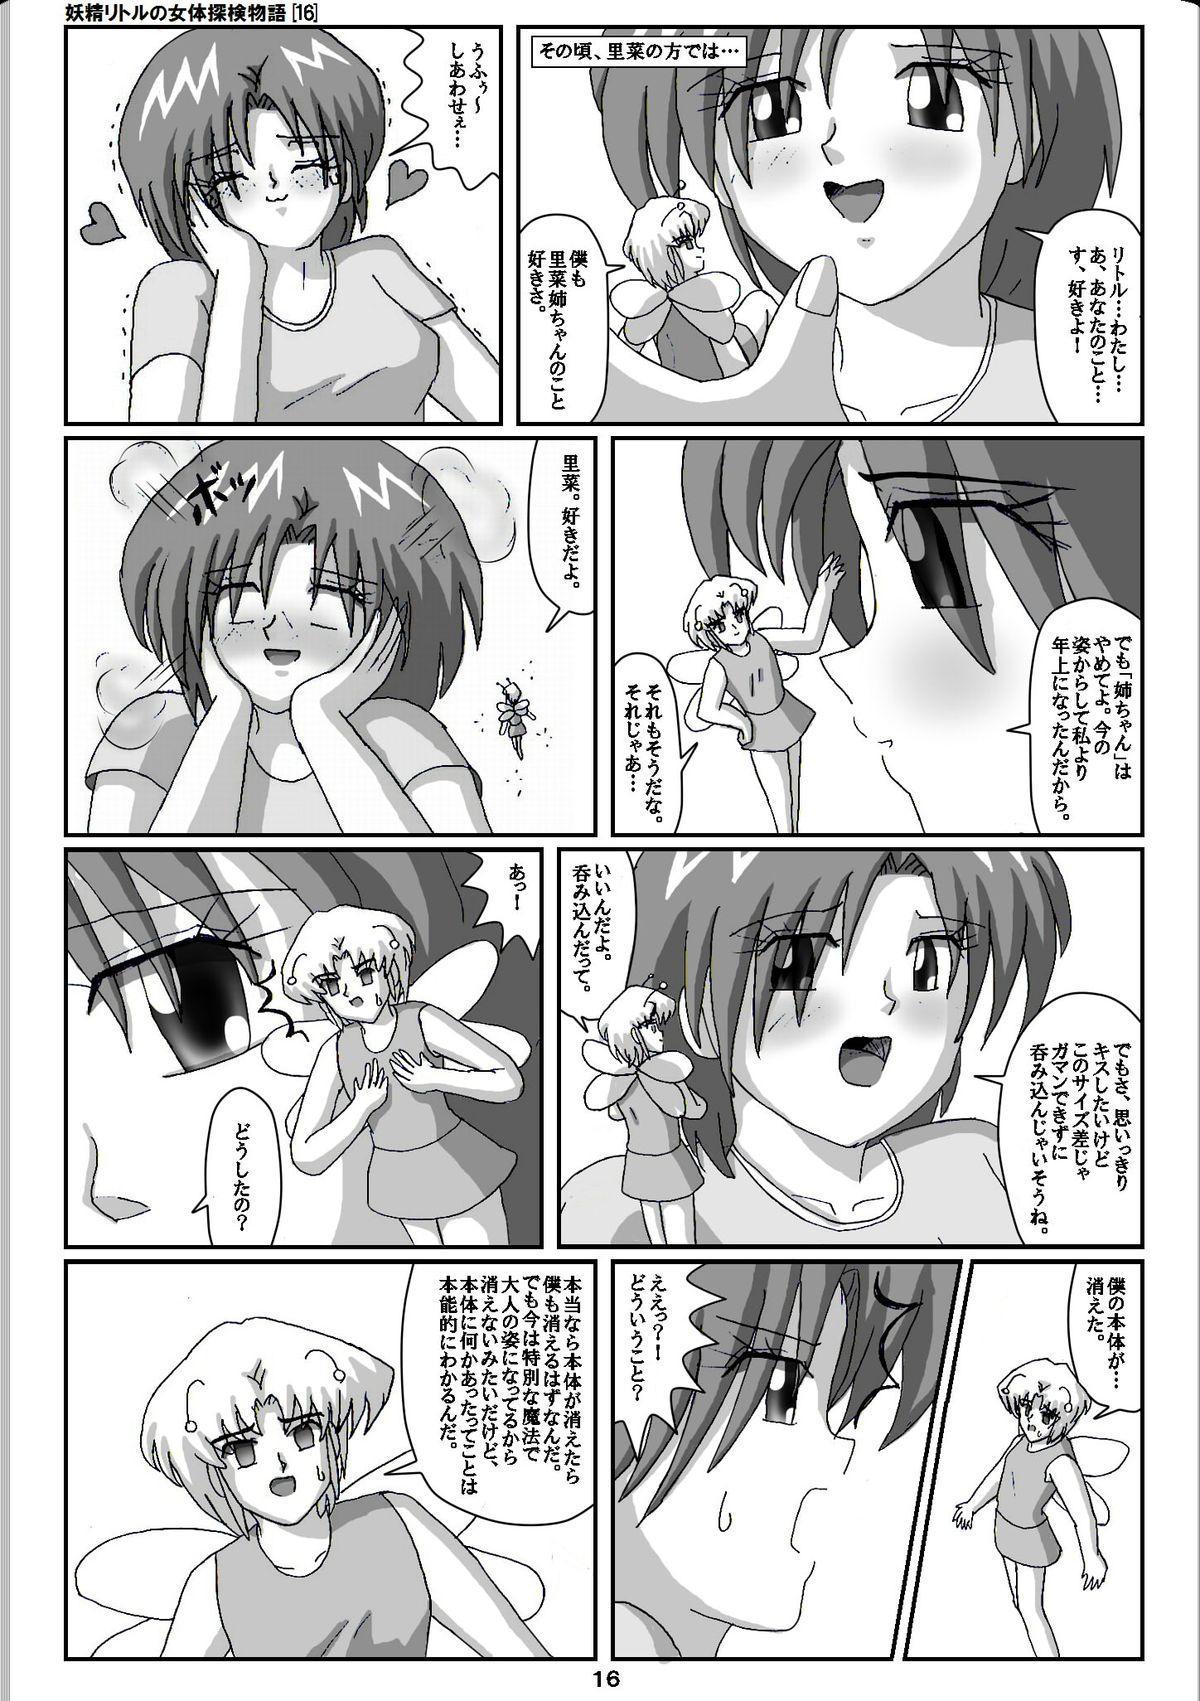 Yousei Little no Nyotai Tanken Monogatari 15